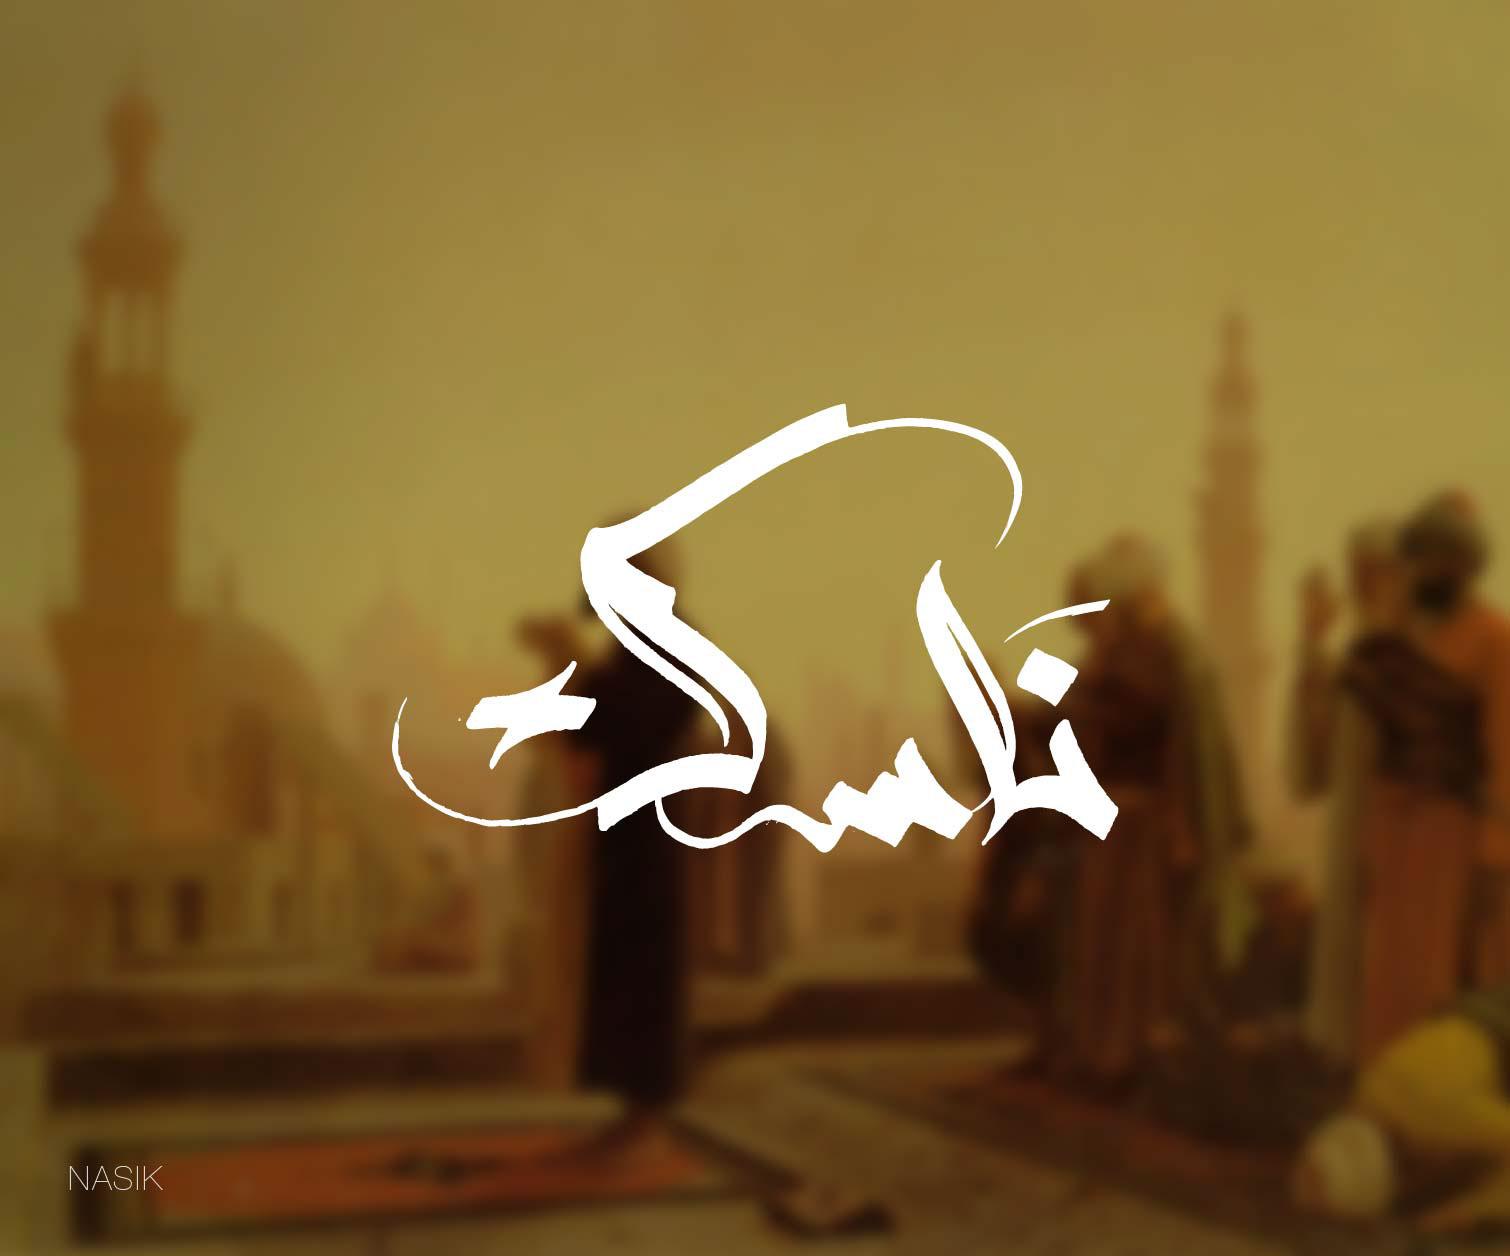 Freestyle_Calligraphy_01 on Behance